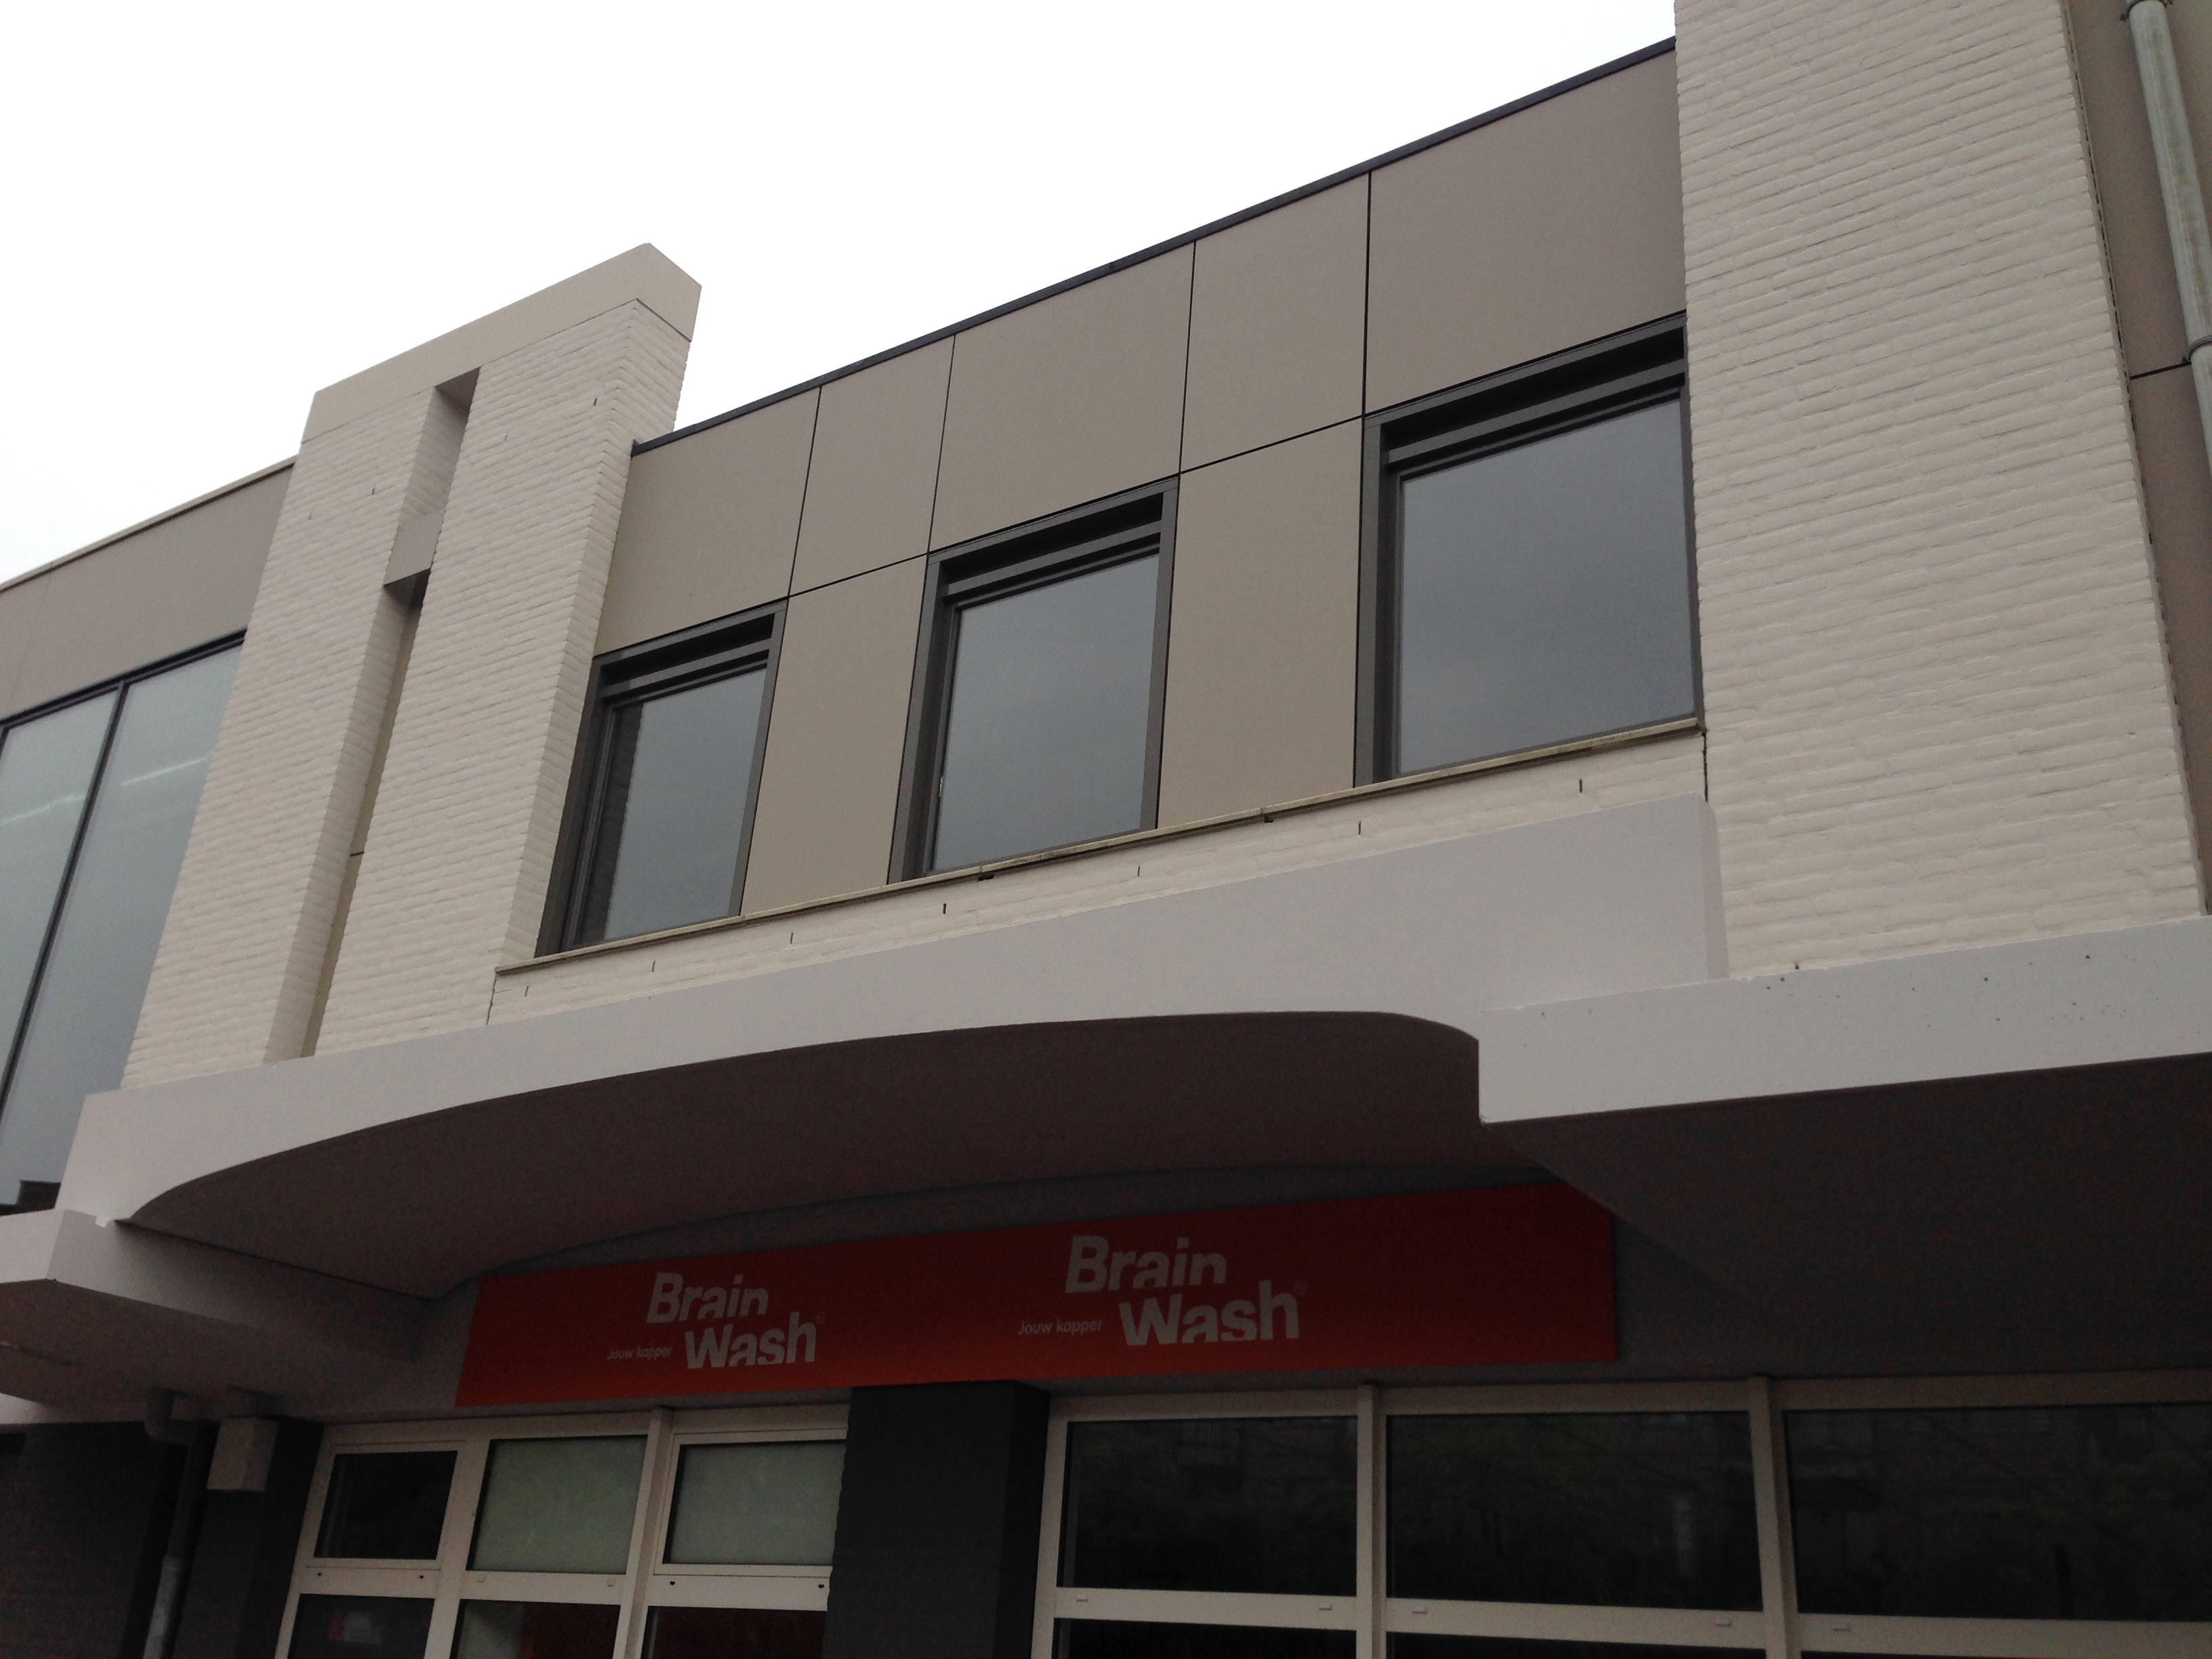 Winkelcentrum Etten Leur 4